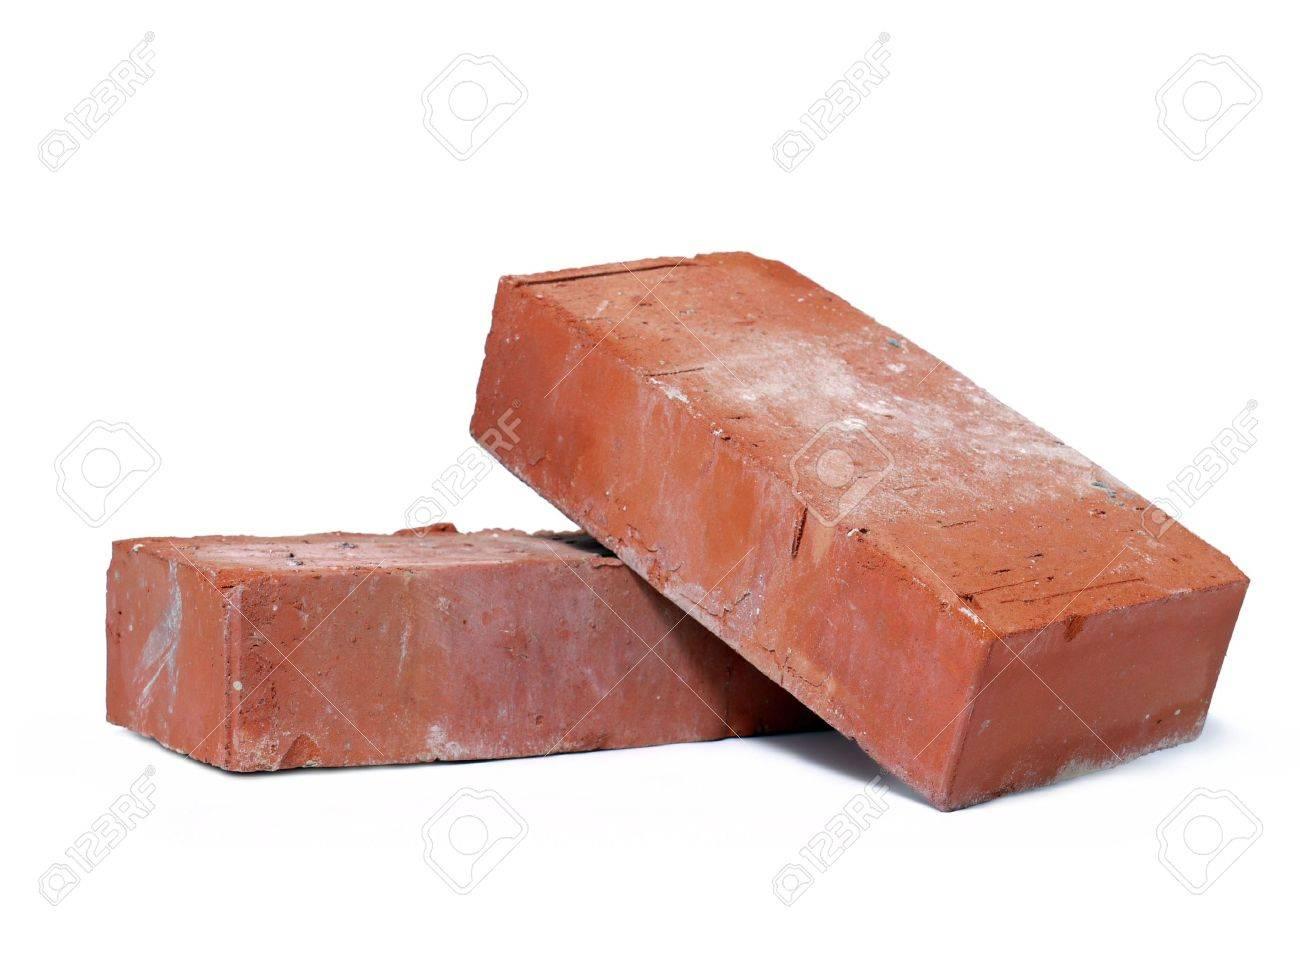 Two solid bricks shot on white background Stock Photo - 5285655